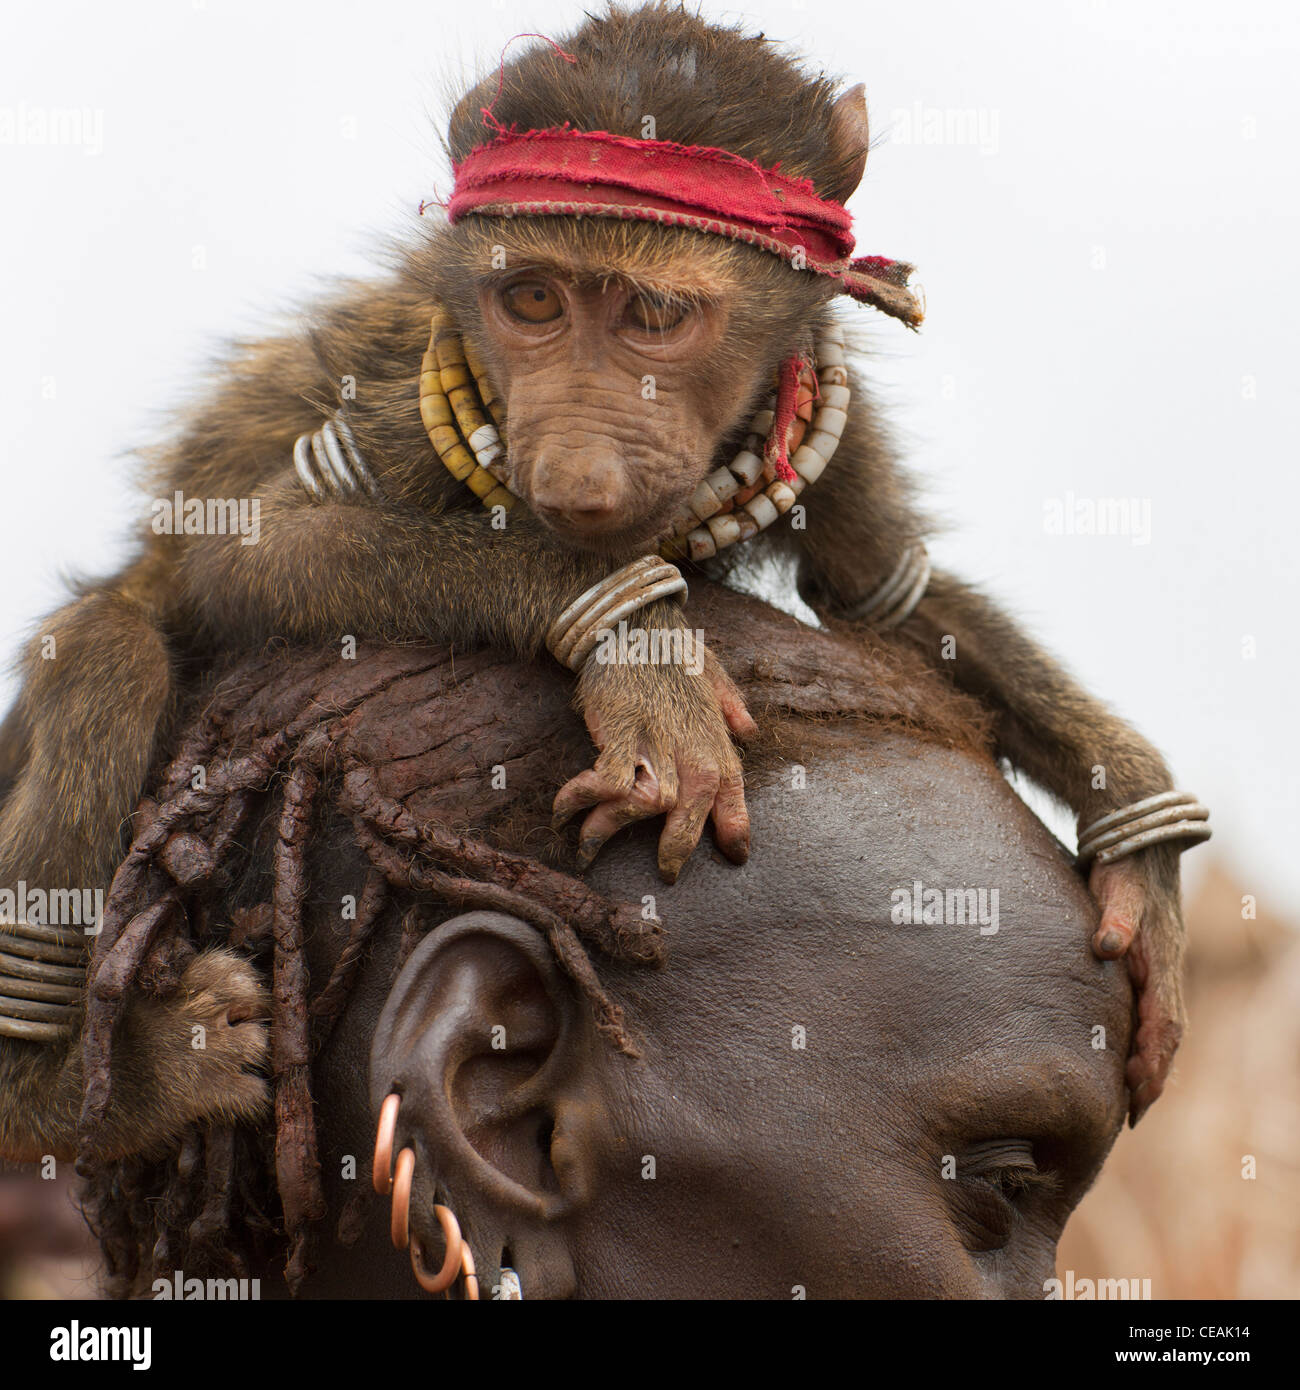 ethiopia monkey stock photos u0026 ethiopia monkey stock images alamy